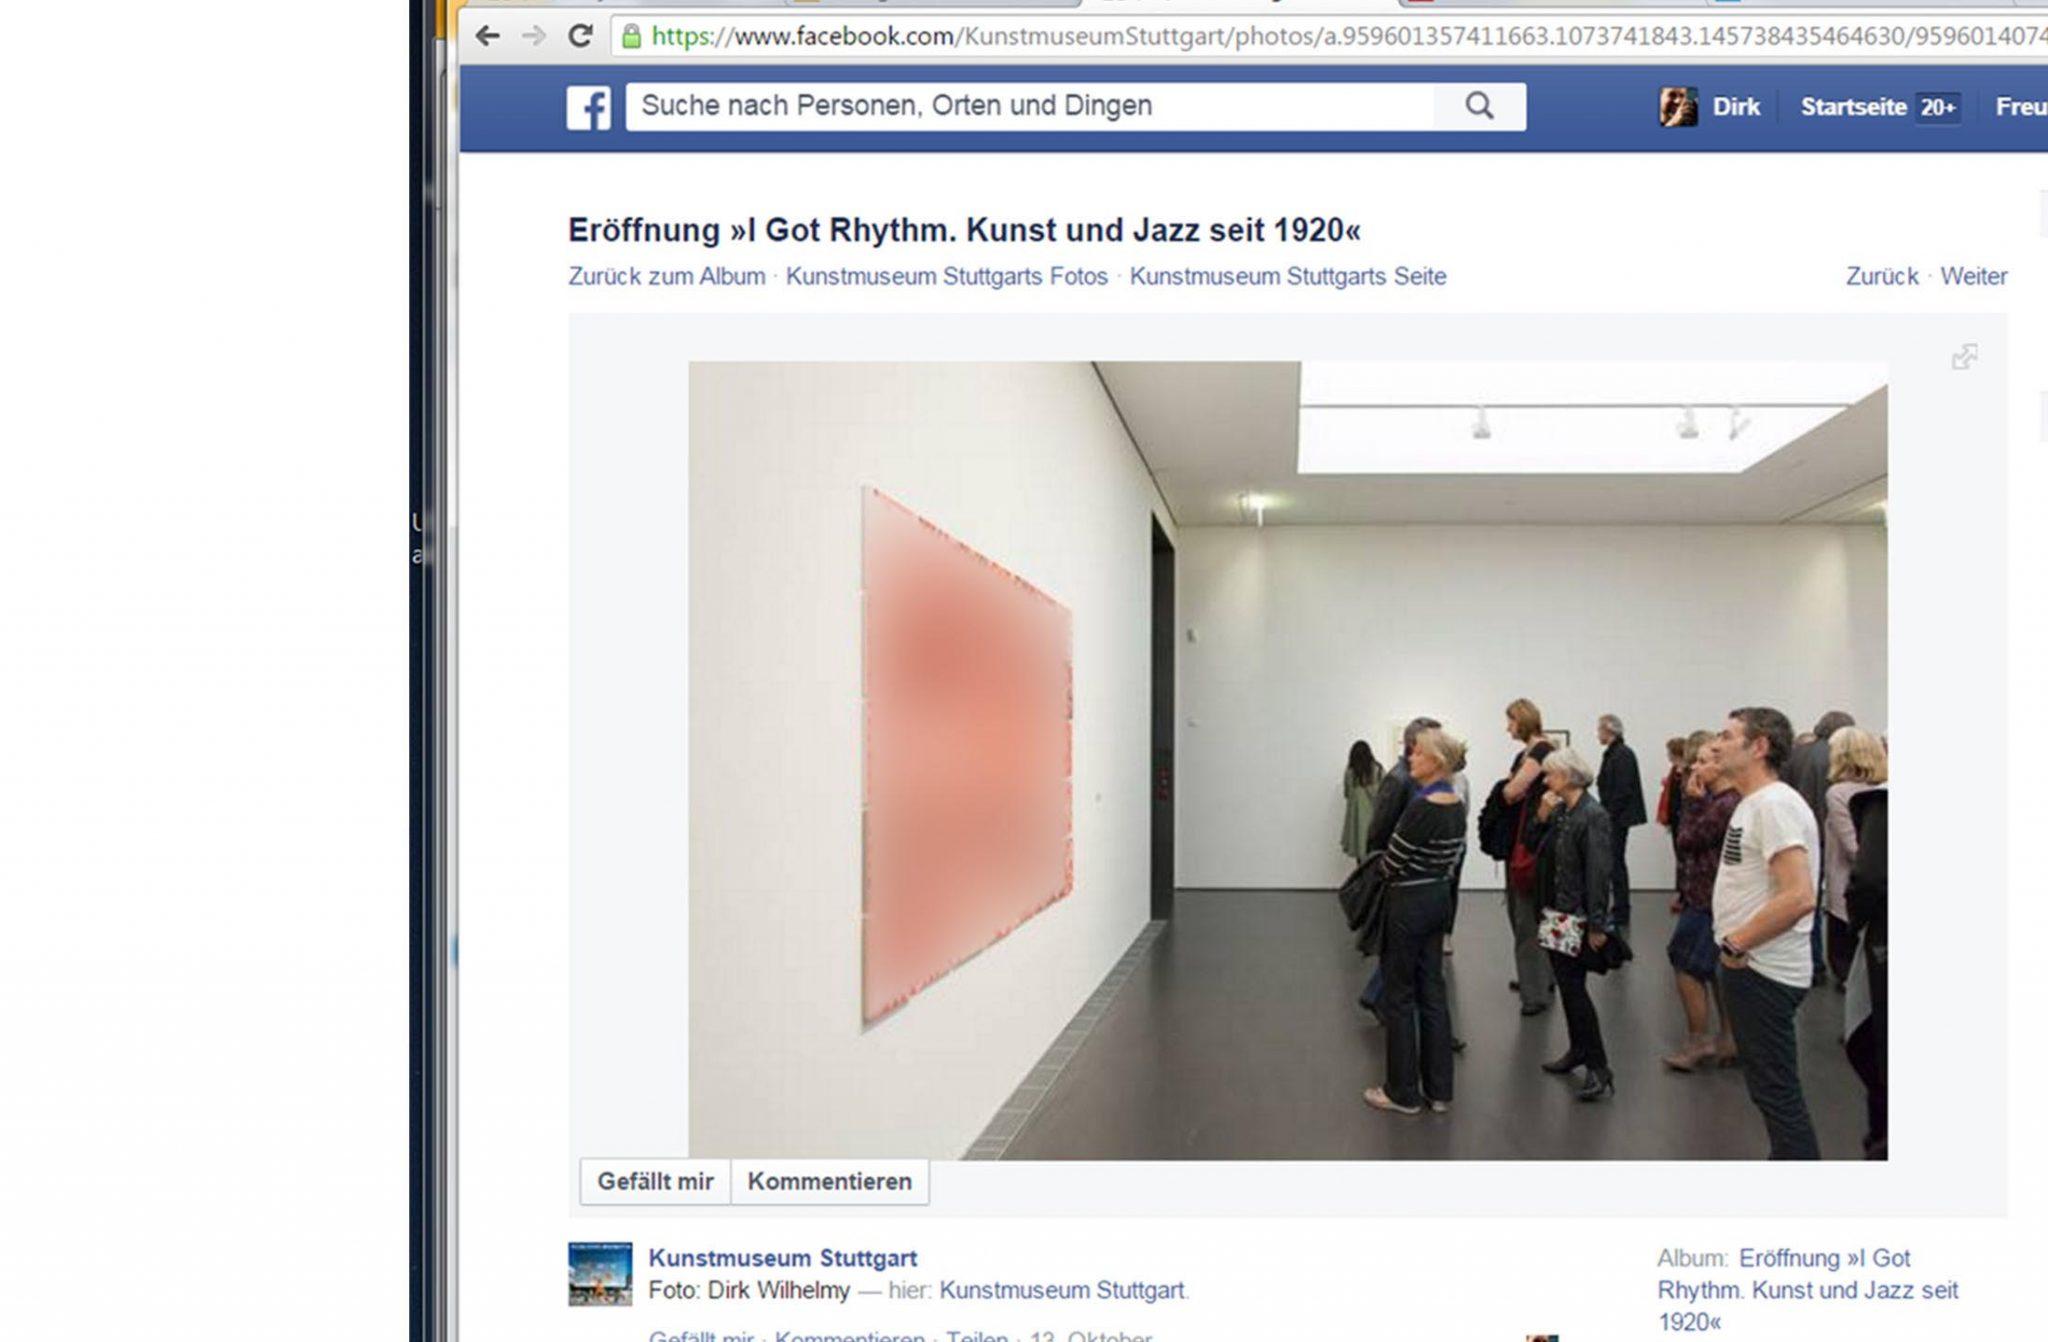 I got Rhythm, Kunstmuseum Stuttgart